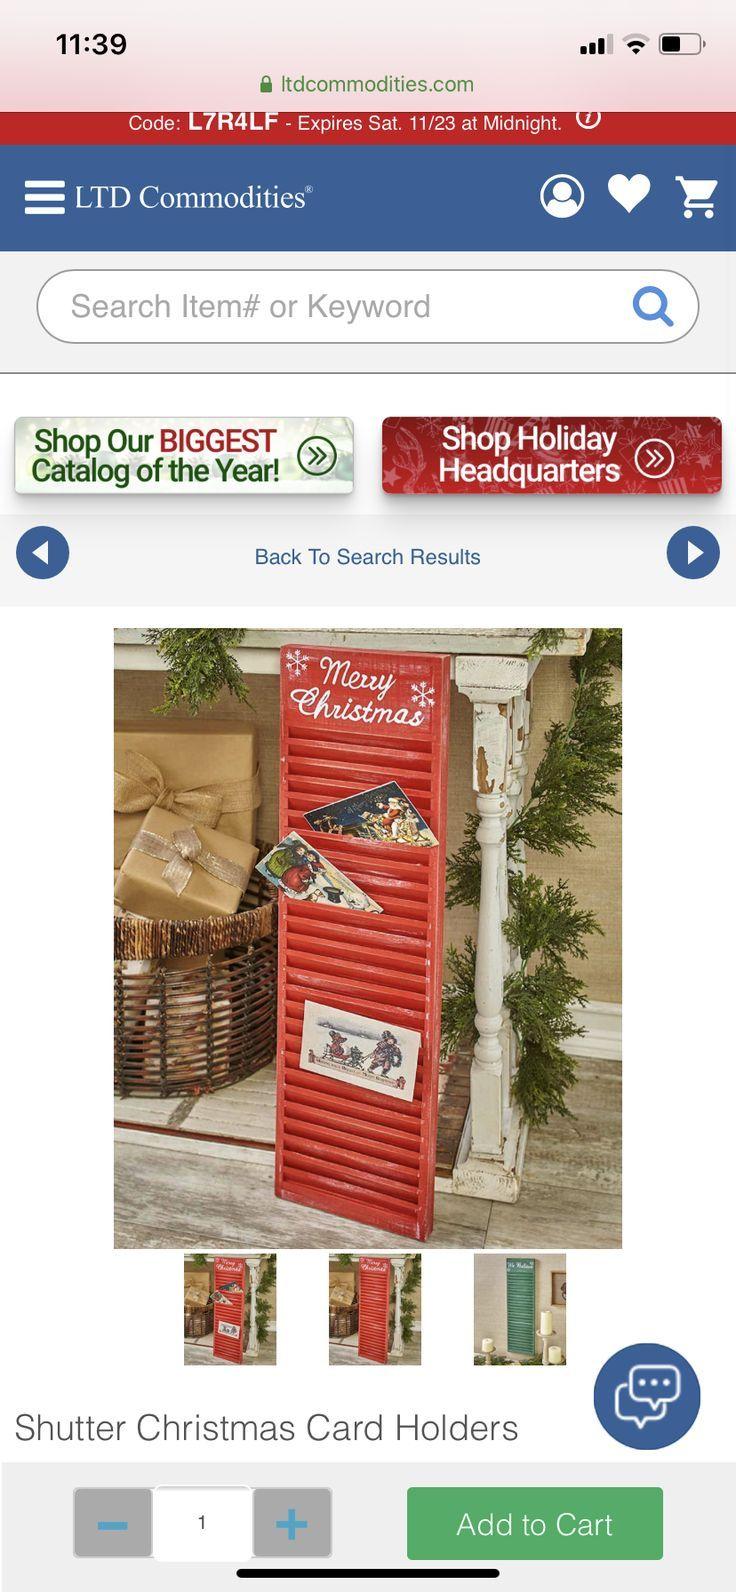 Ltd Catalog Christmas 2020 Ltd Commodities Catalog Christmas in 2020 | Christmas card holders